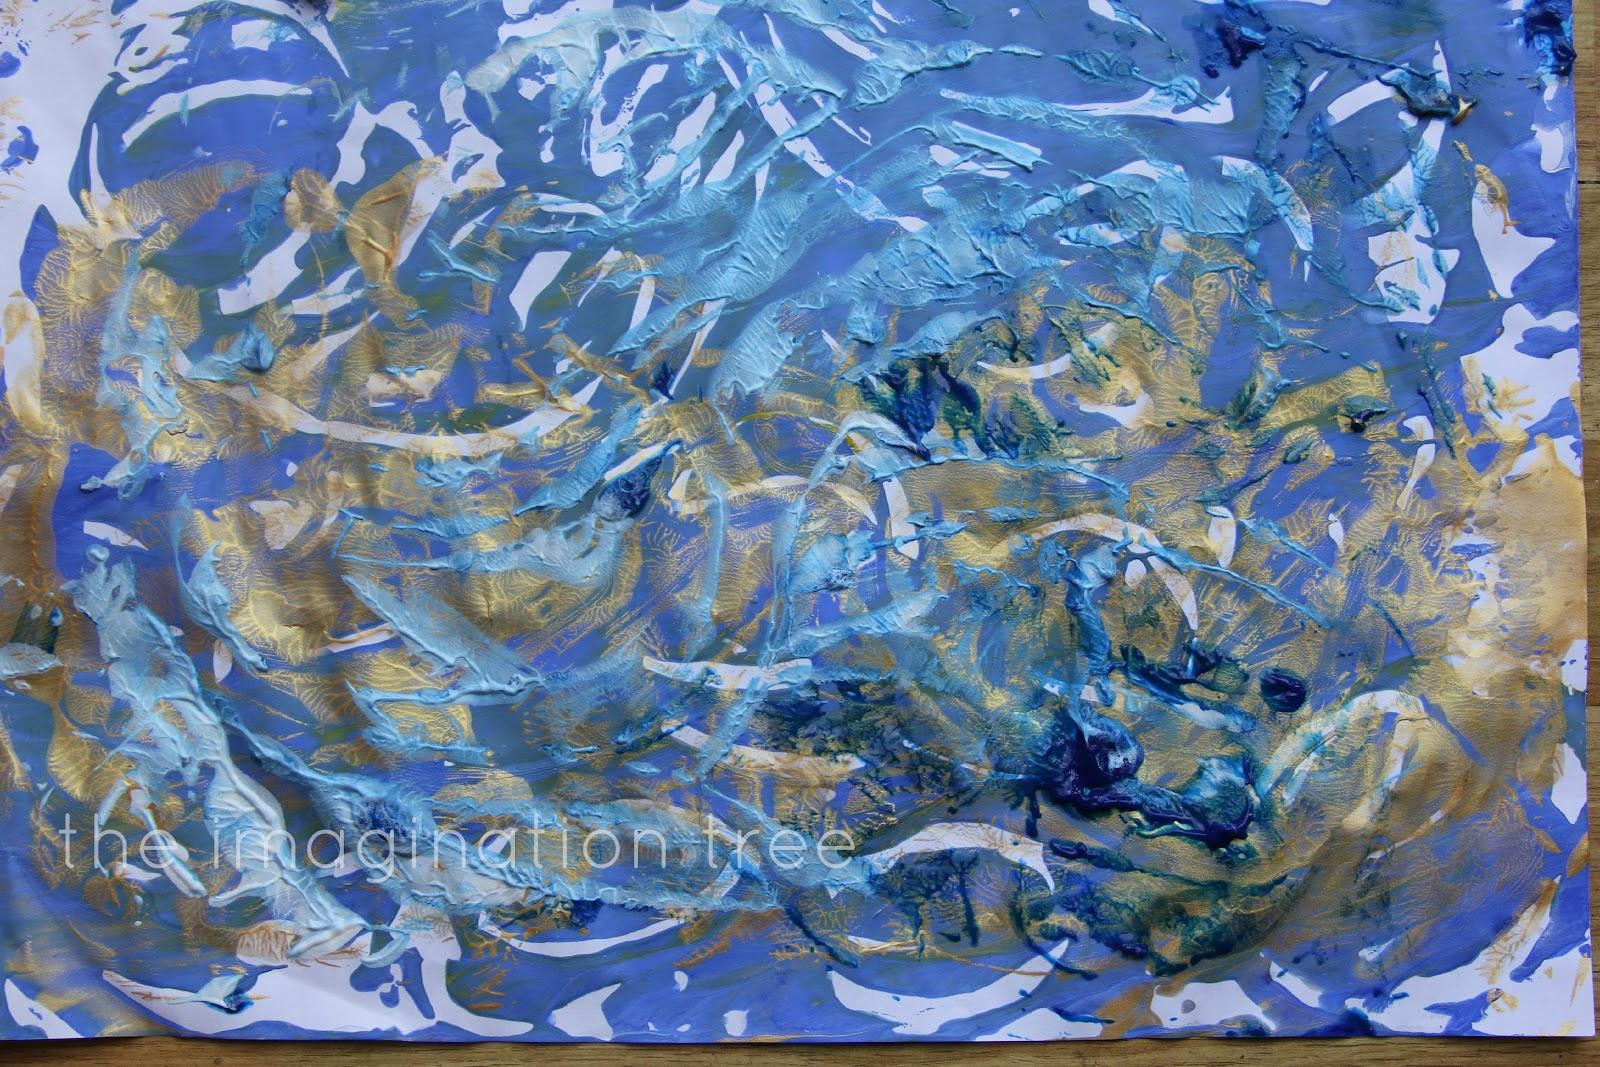 Van Gogh Style Finger Paint Printing The Imagination Tree